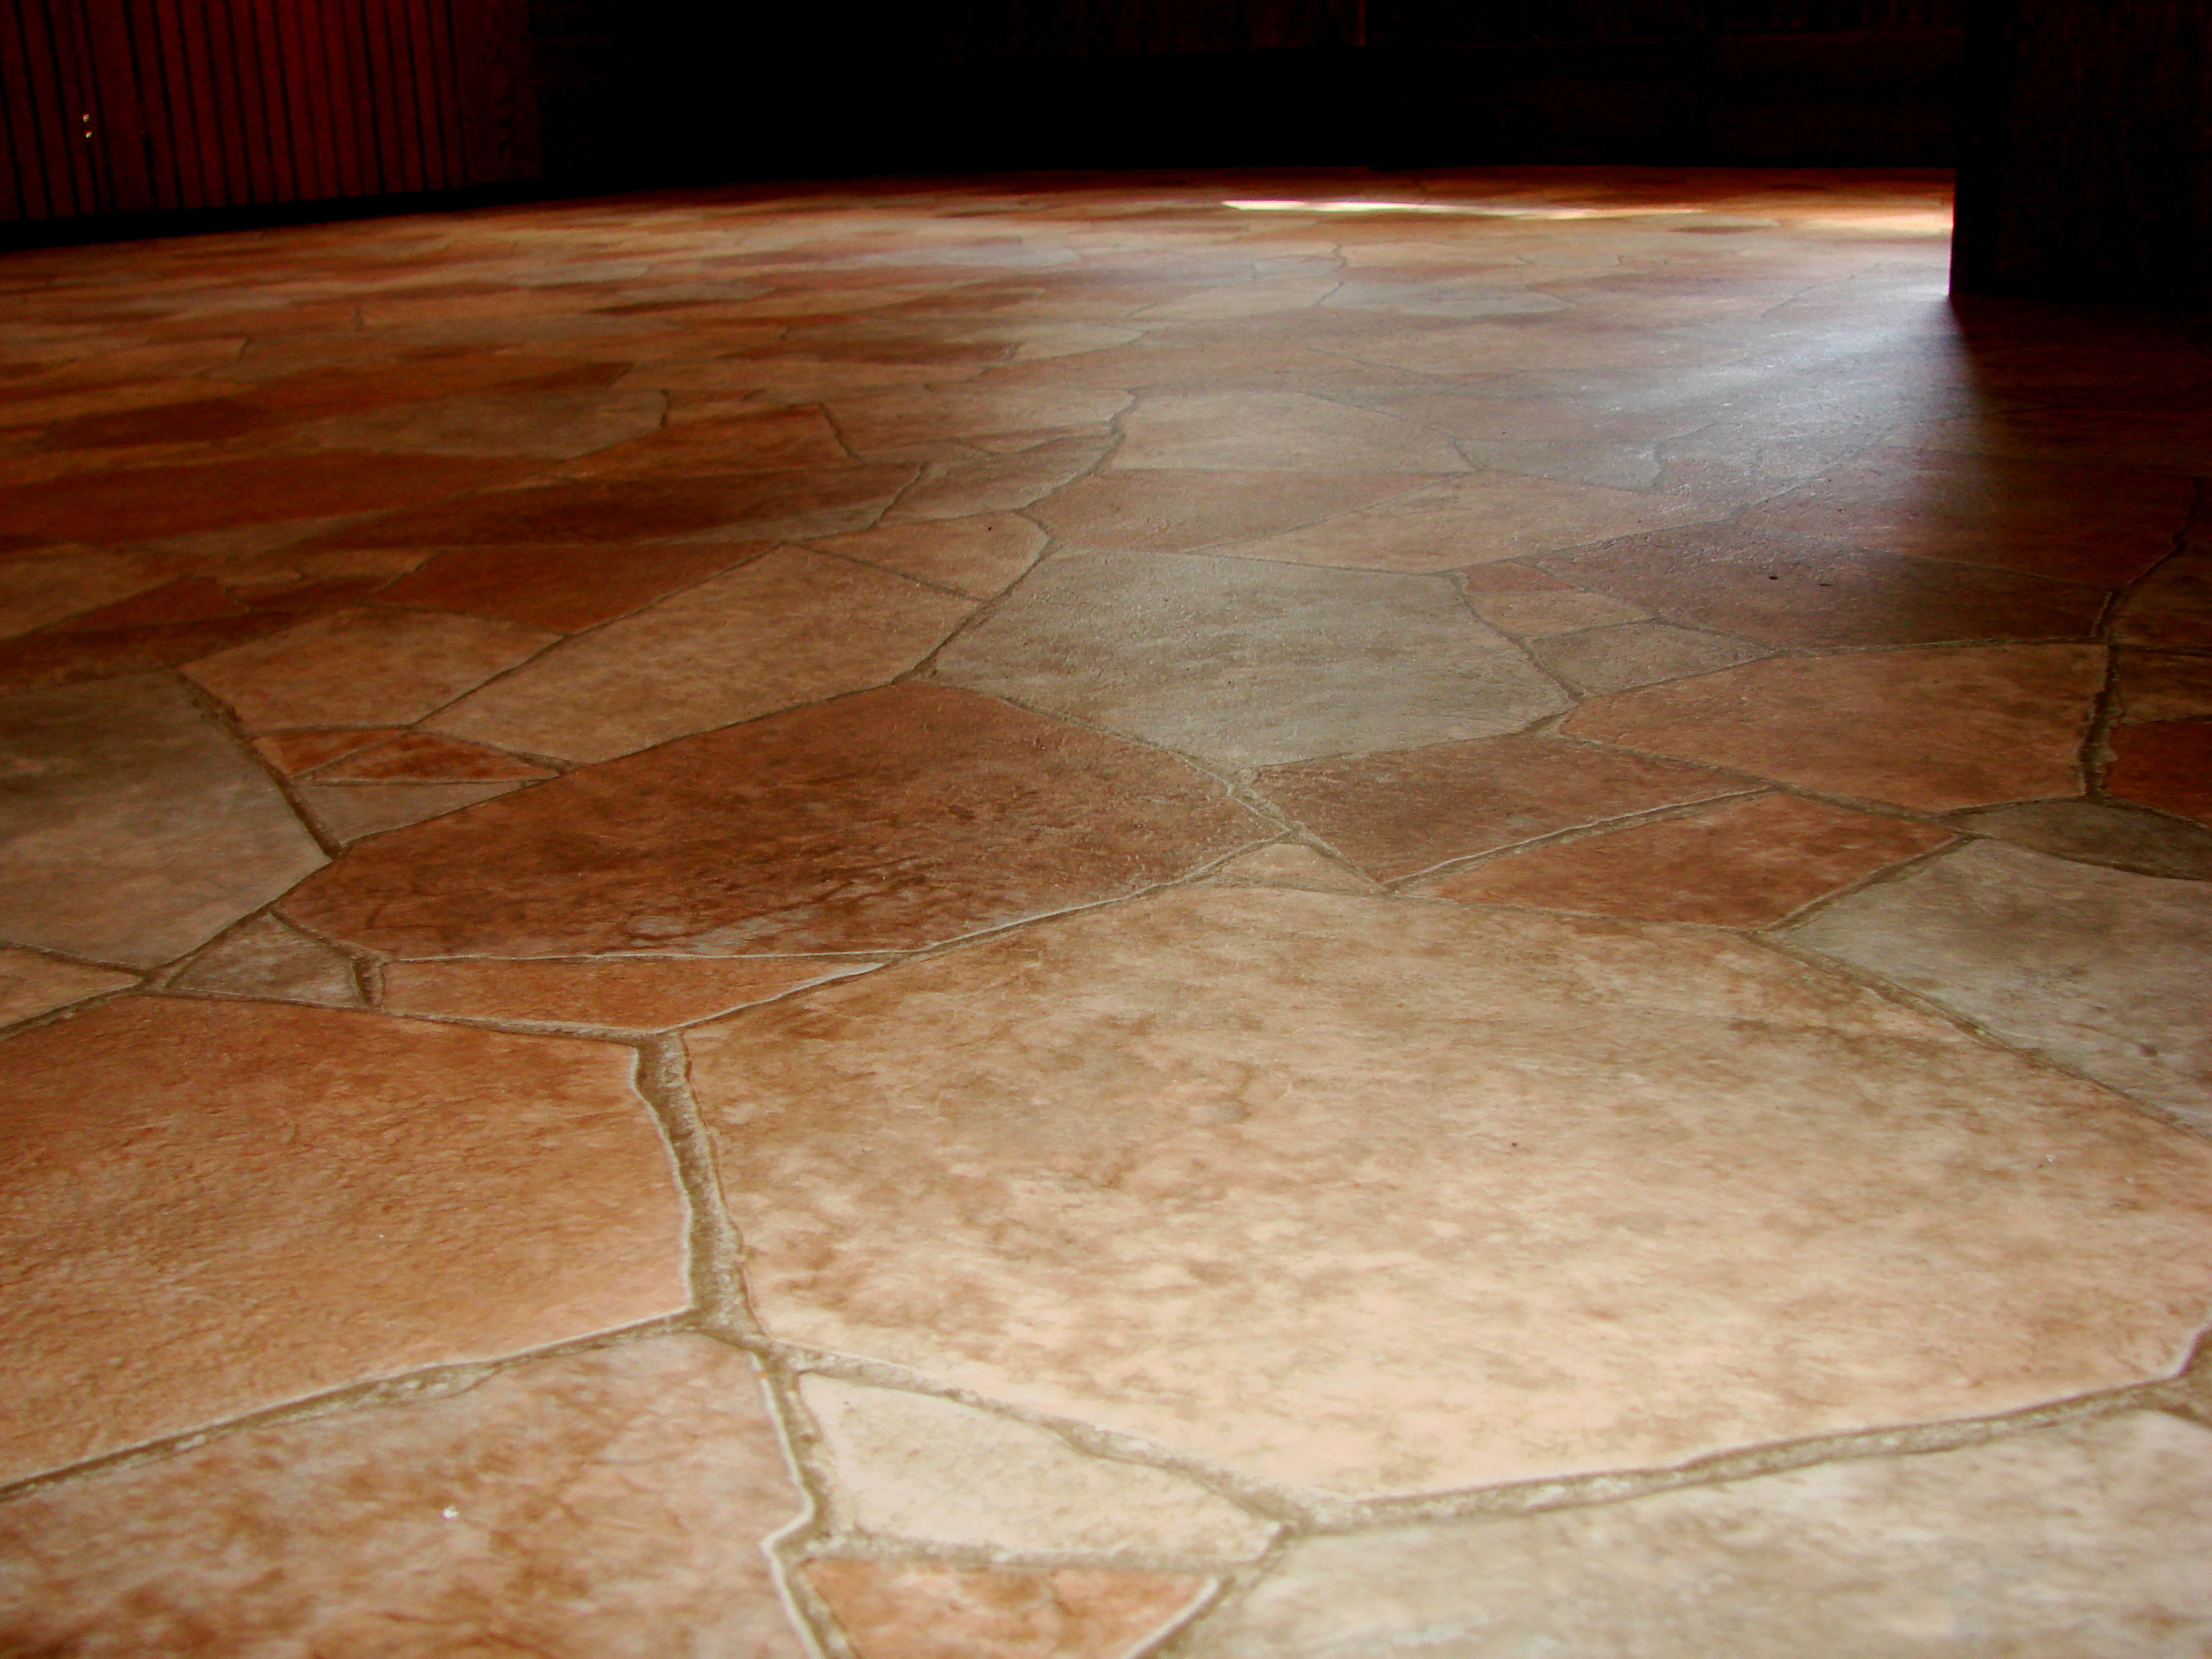 finest tile flooring for bathroom inspiration-Contemporary Tile Flooring for Bathroom Plan